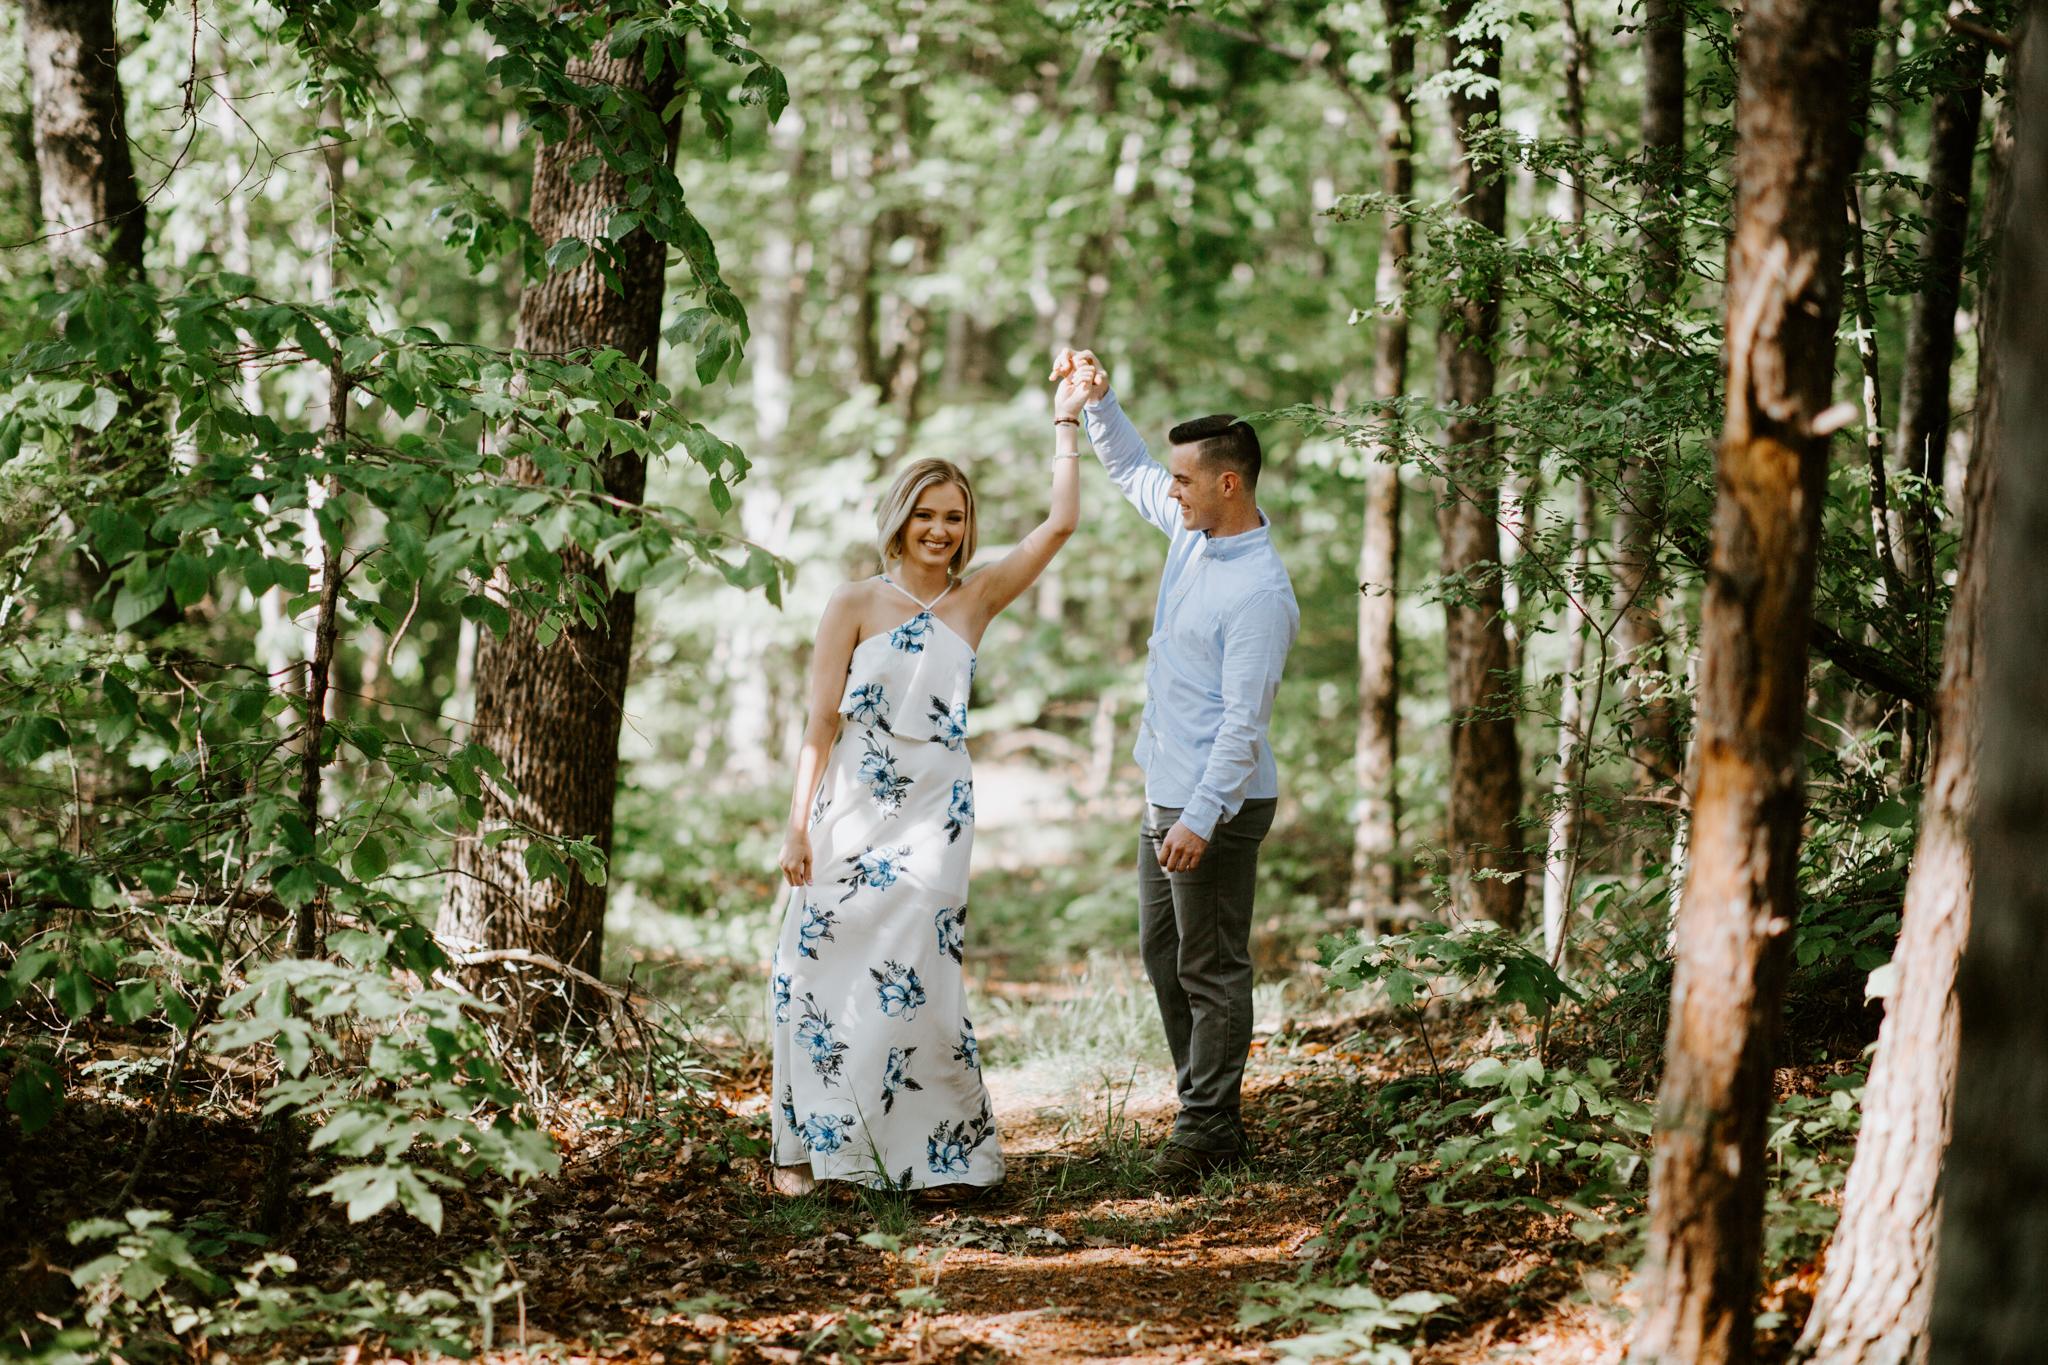 Courtney-Jordan-Chattanooga-Nashville-Tennessee-Wedding-Elopement-Photographer-27.jpg